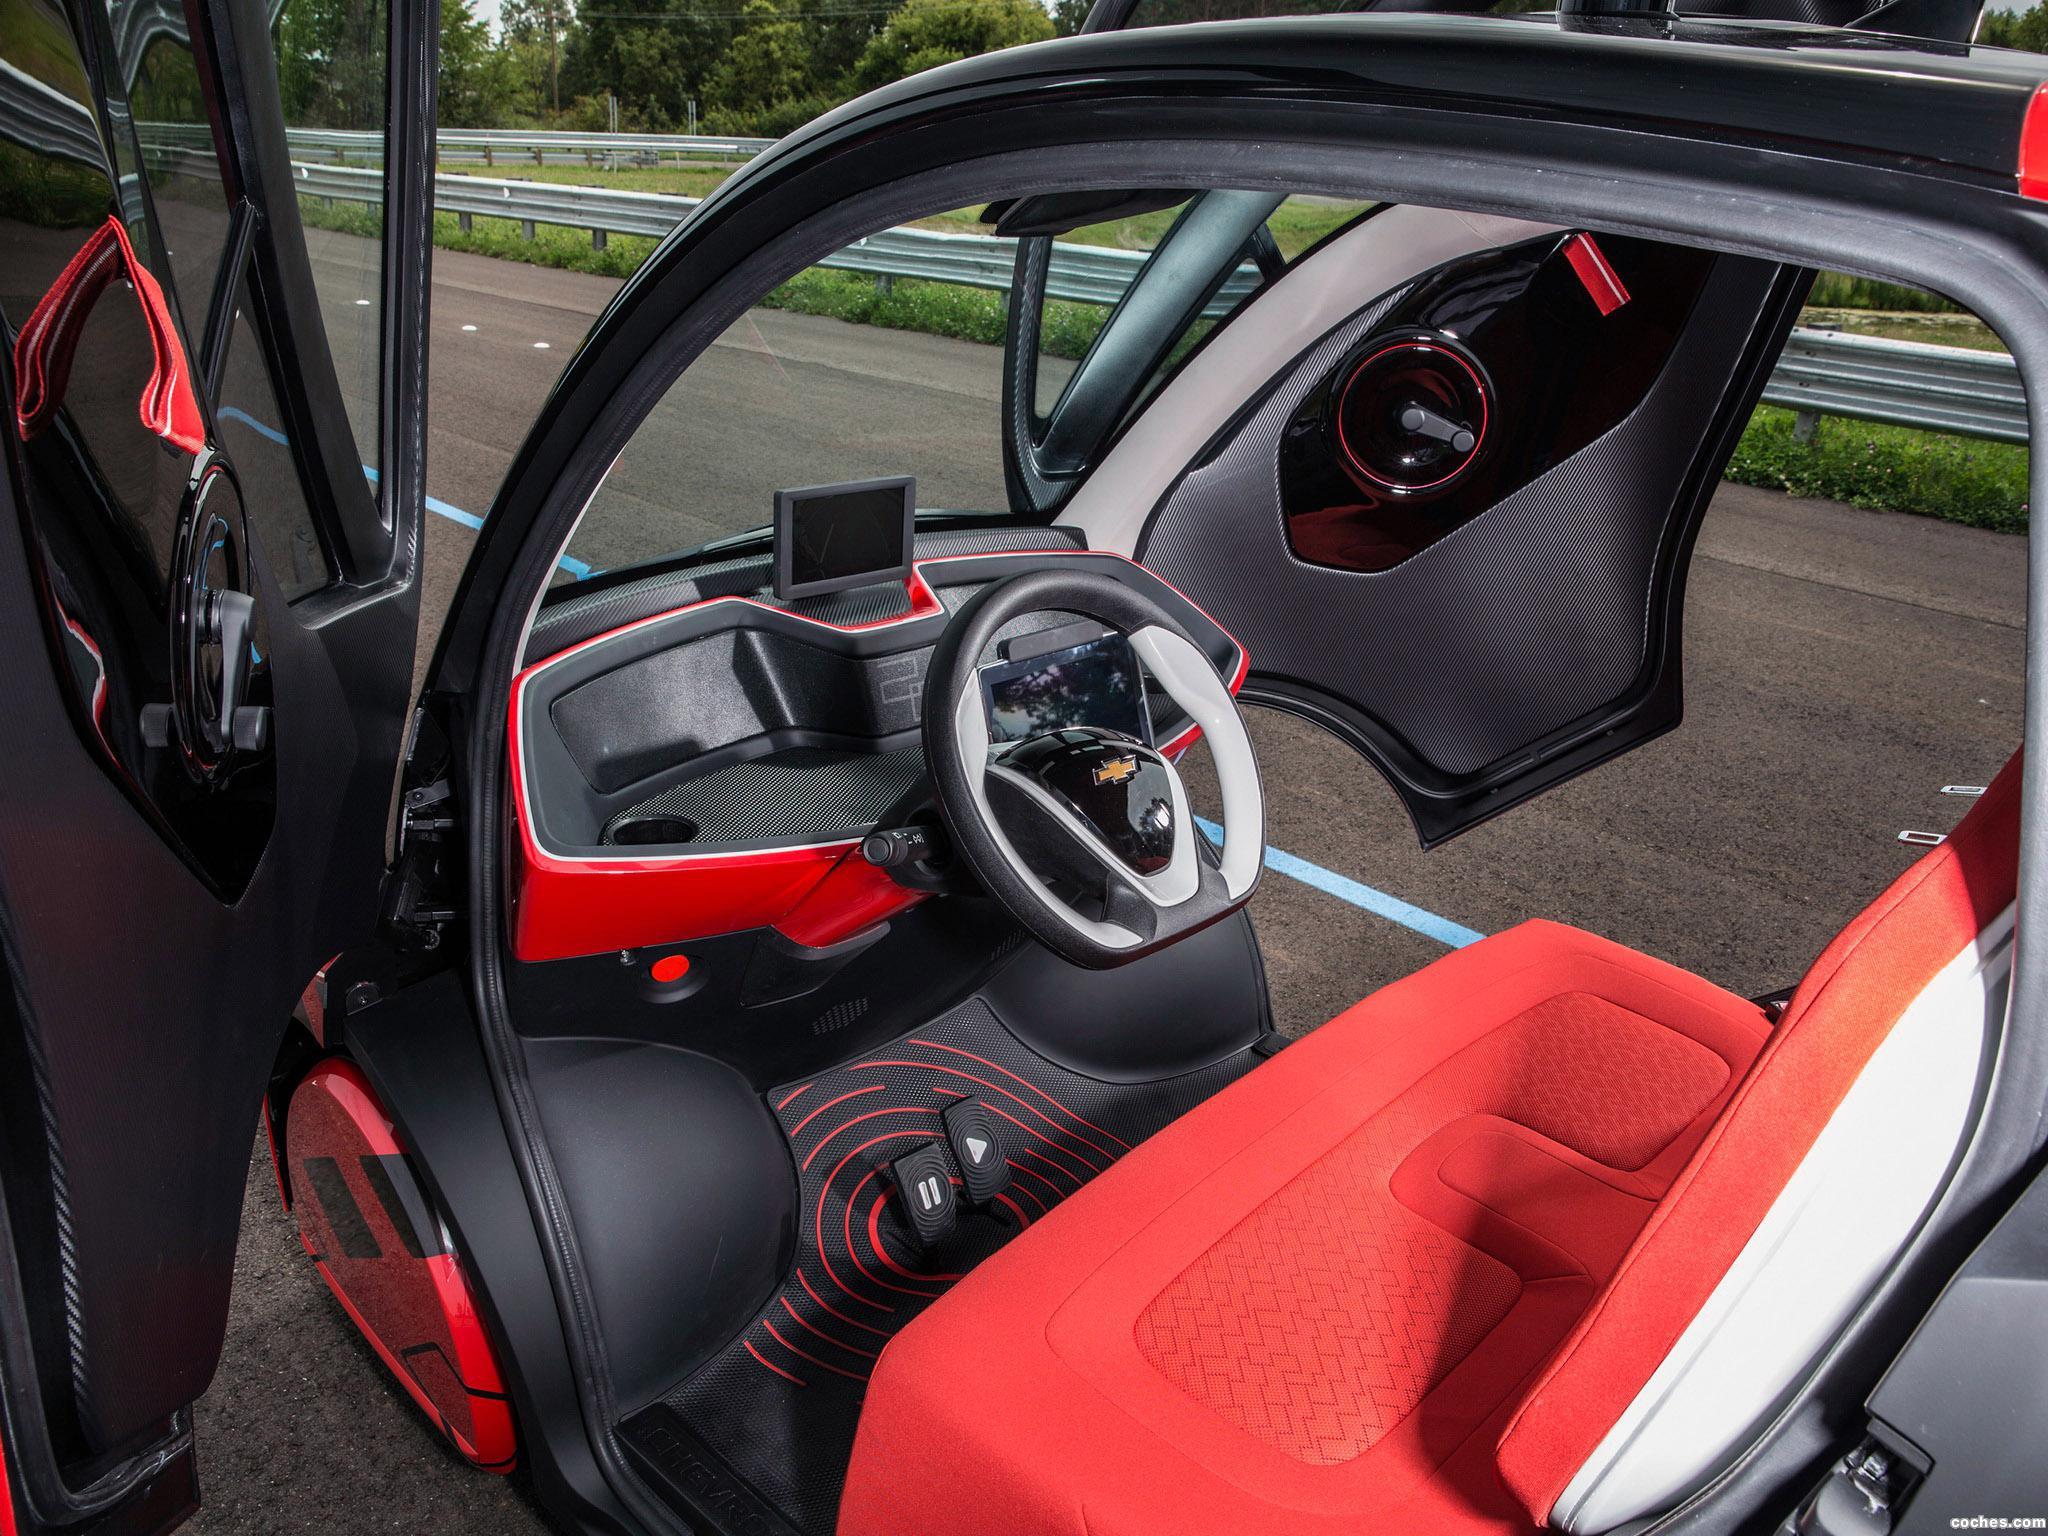 Foto 2 de Chevrolet Electric Networked Vehicle EN-V 2.0 2014